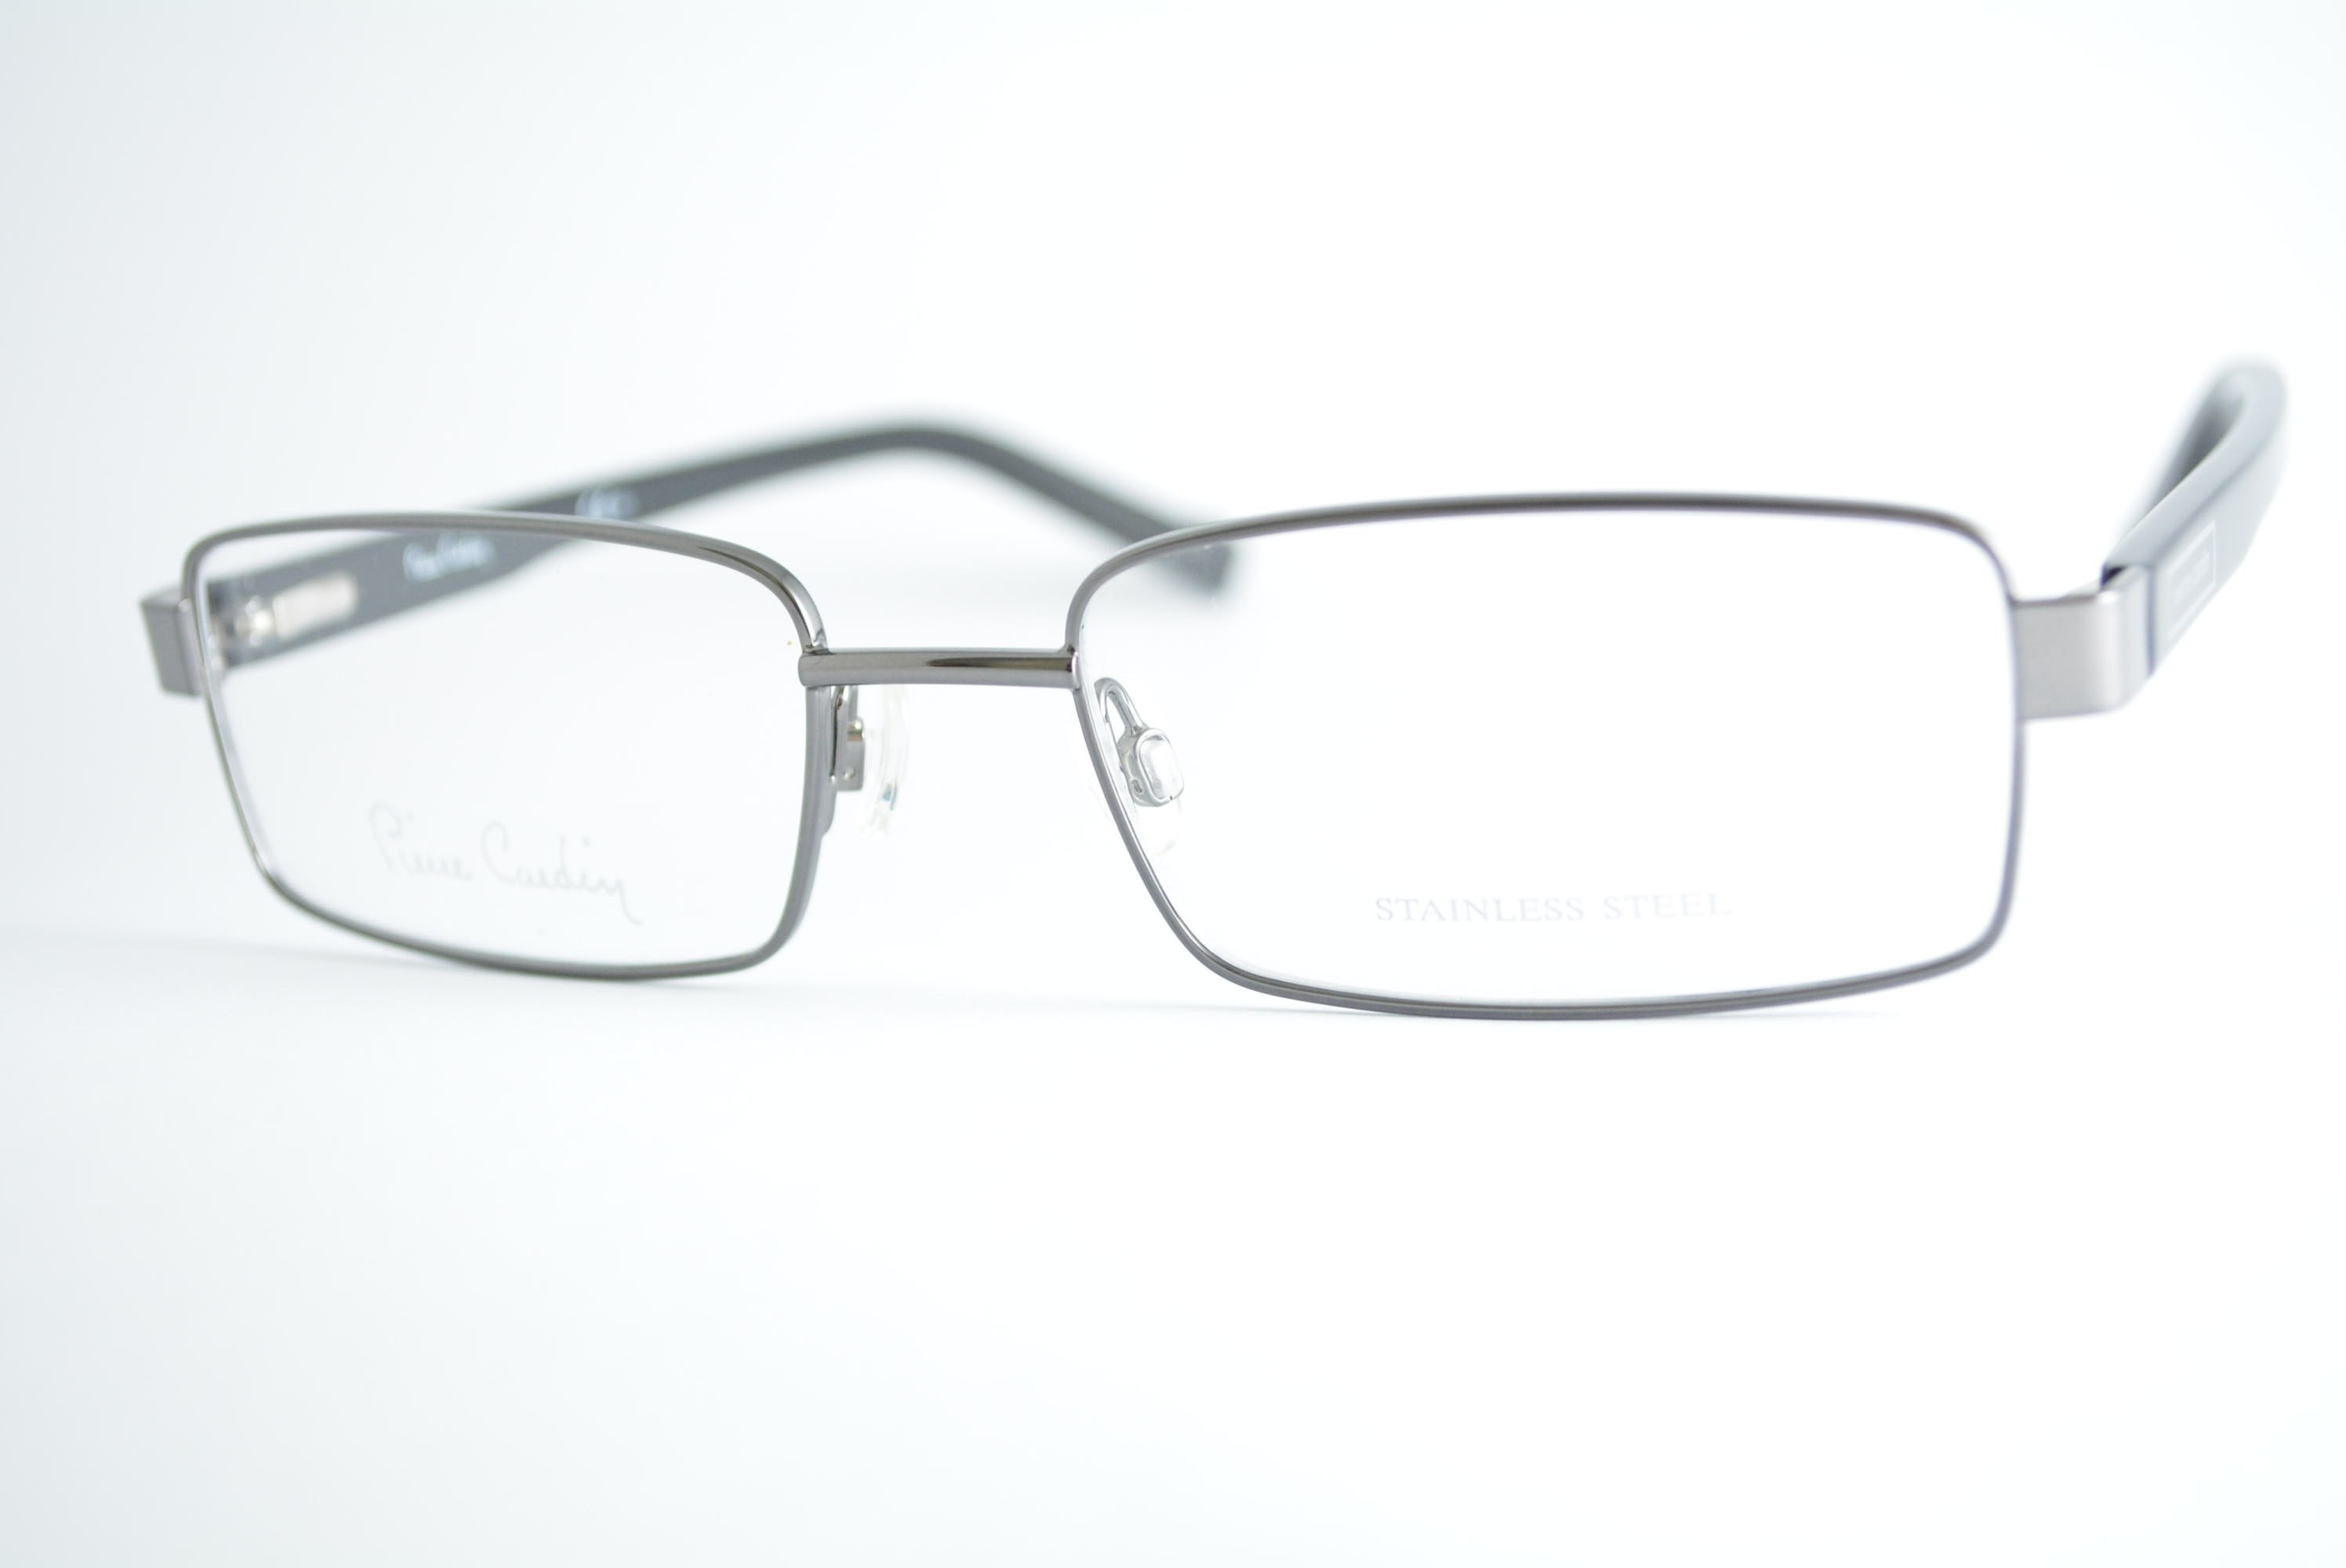 armação de óculos Pierre Cardin mod pc6834 kj1